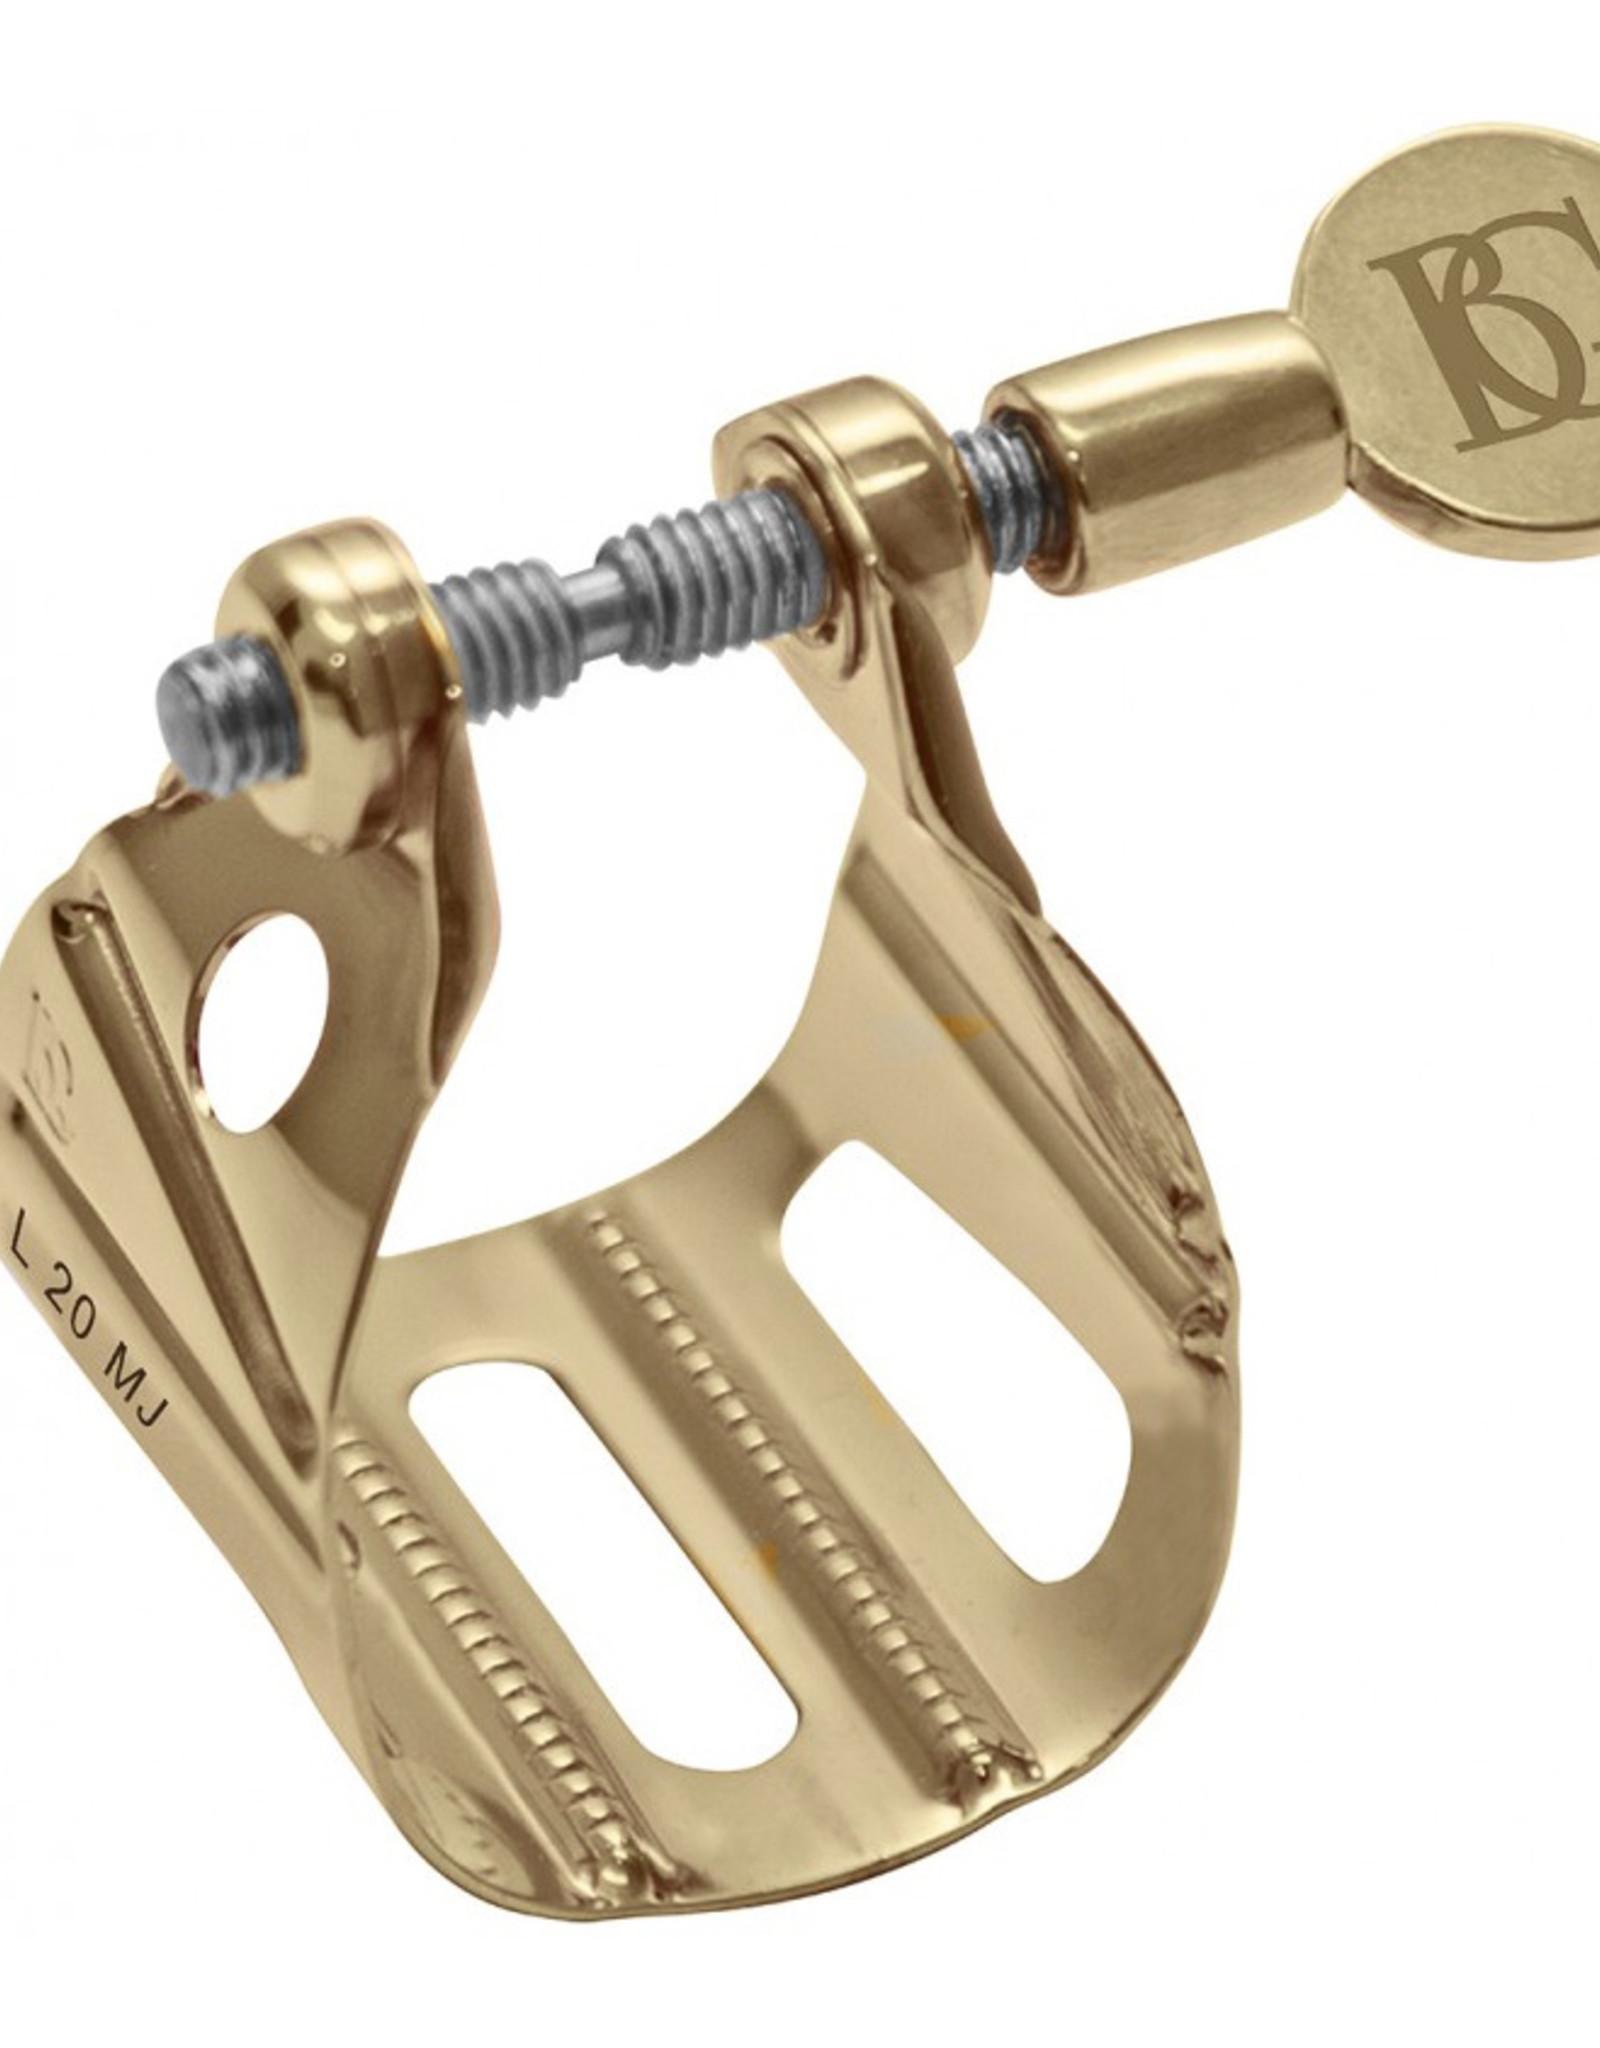 BG France BG Gold Lacquered Metal Jazz Saxophone Ligature Tenor L20 MJ